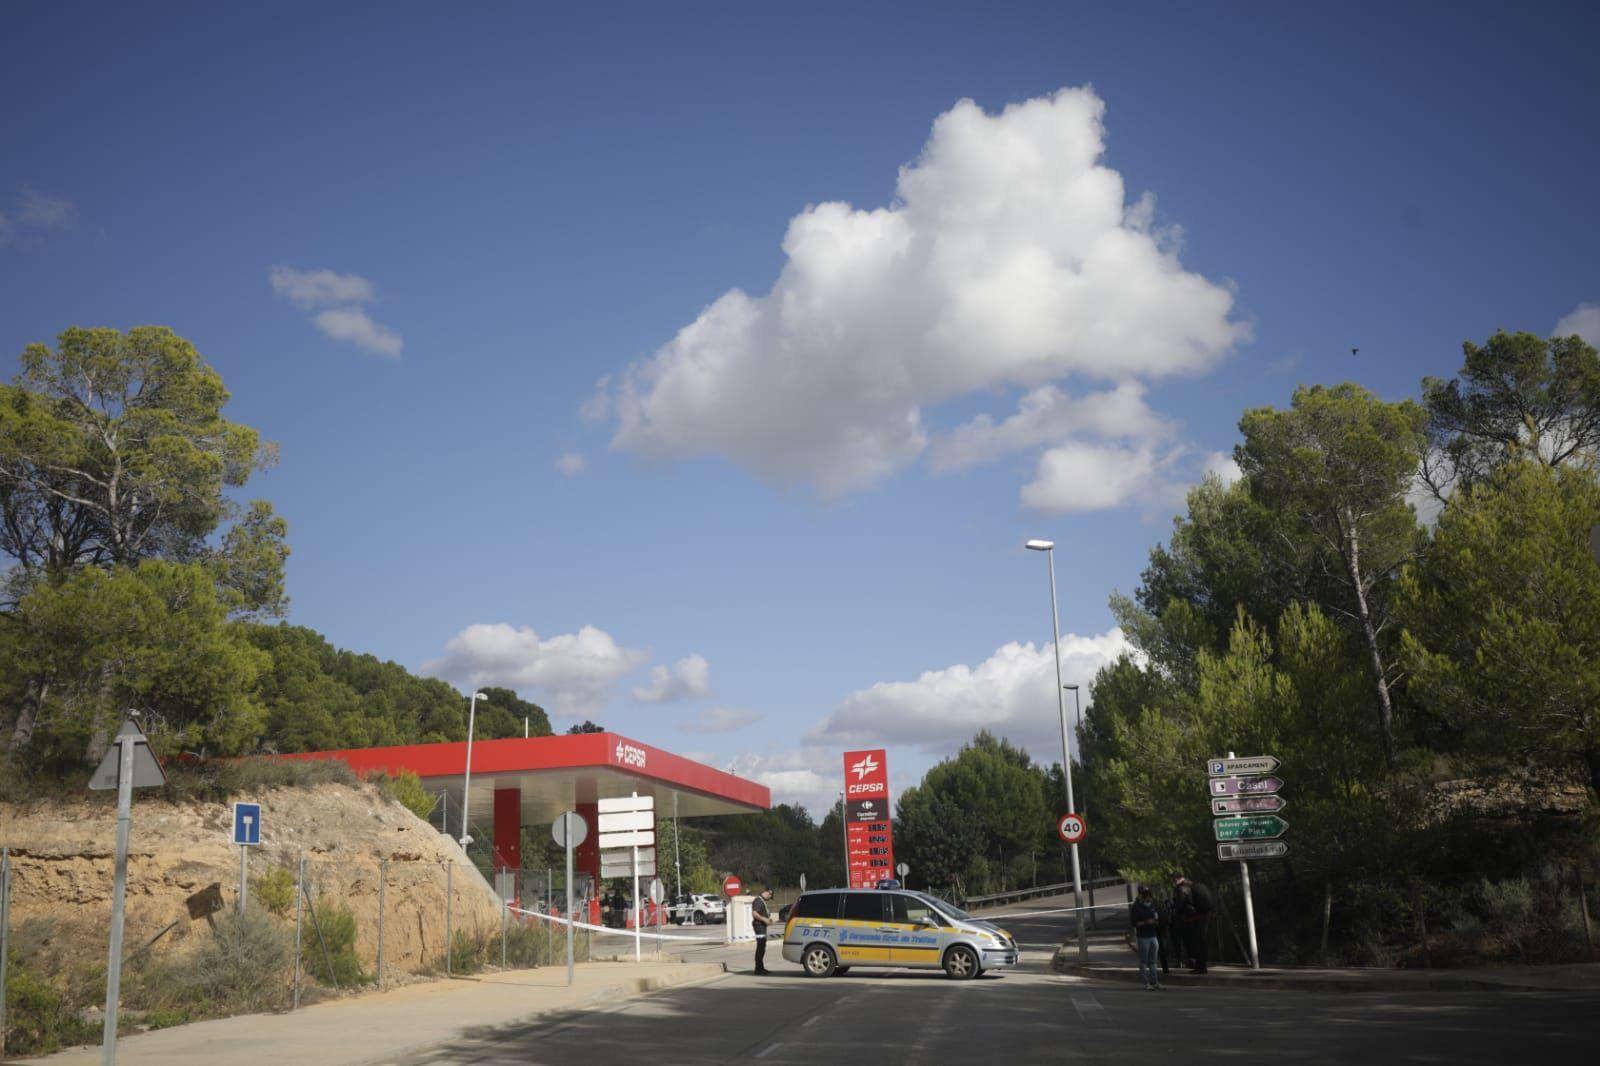 Localizan una pareja muerta en un coche junto a una escopeta en Peguera